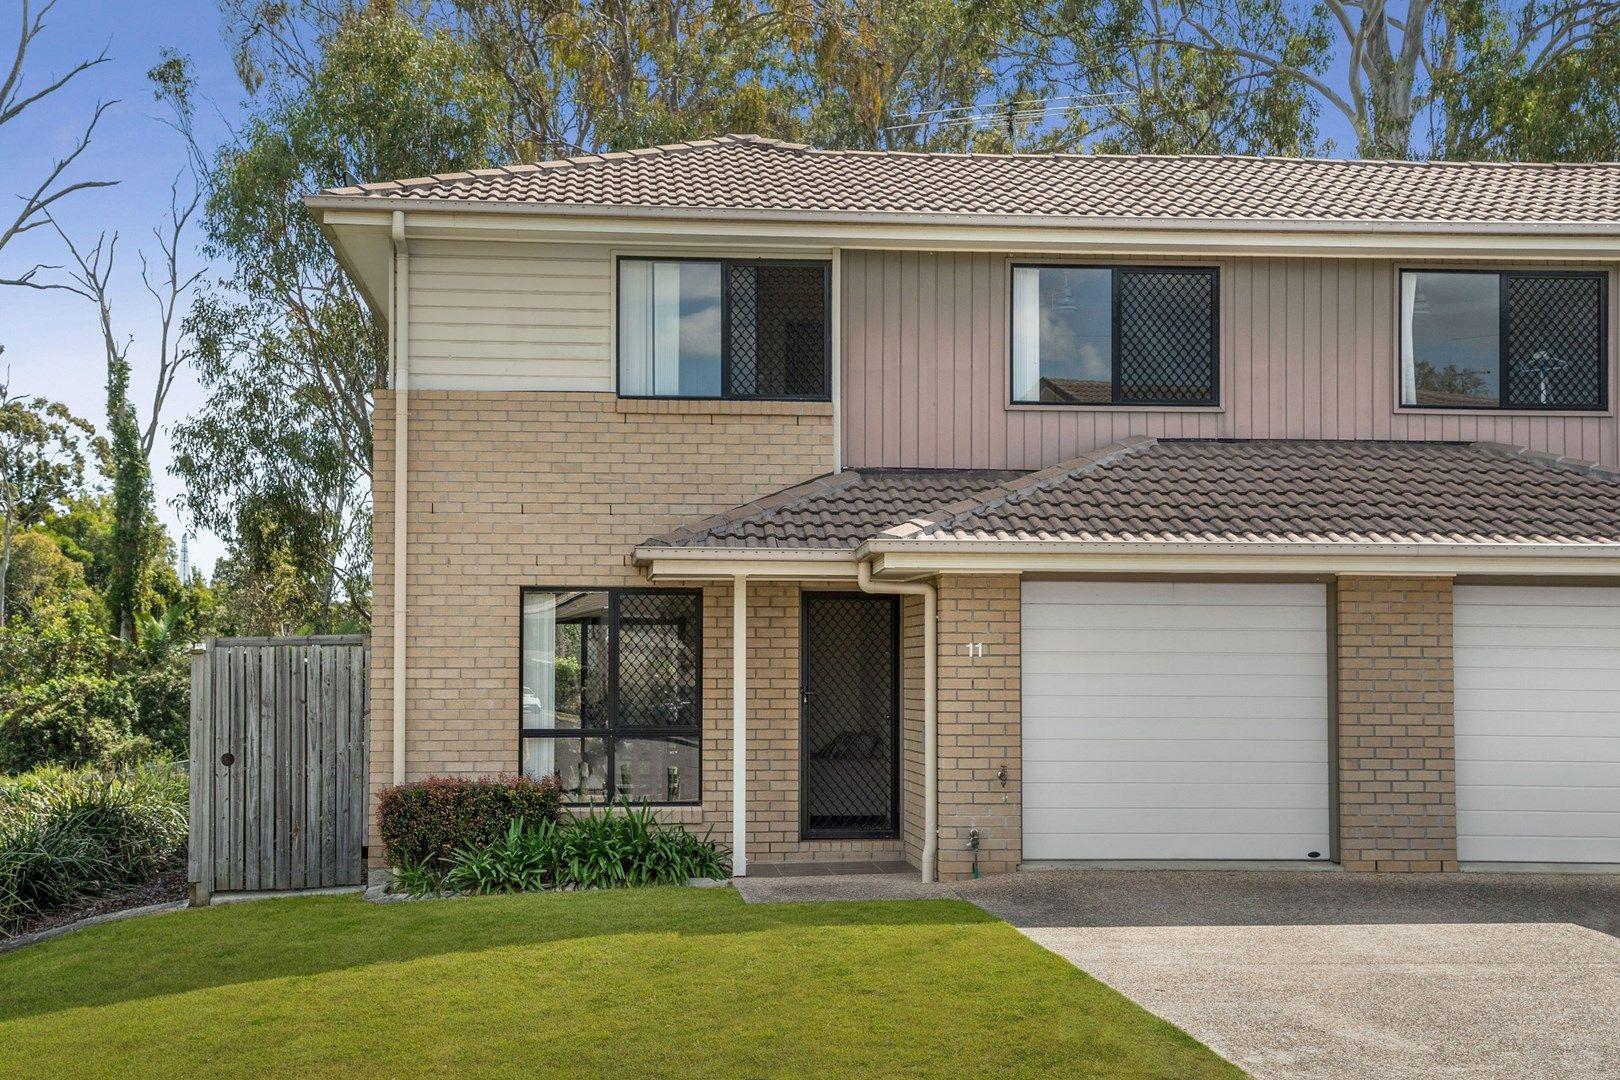 11/93 Penarth Street, Runcorn QLD 4113, Image 0